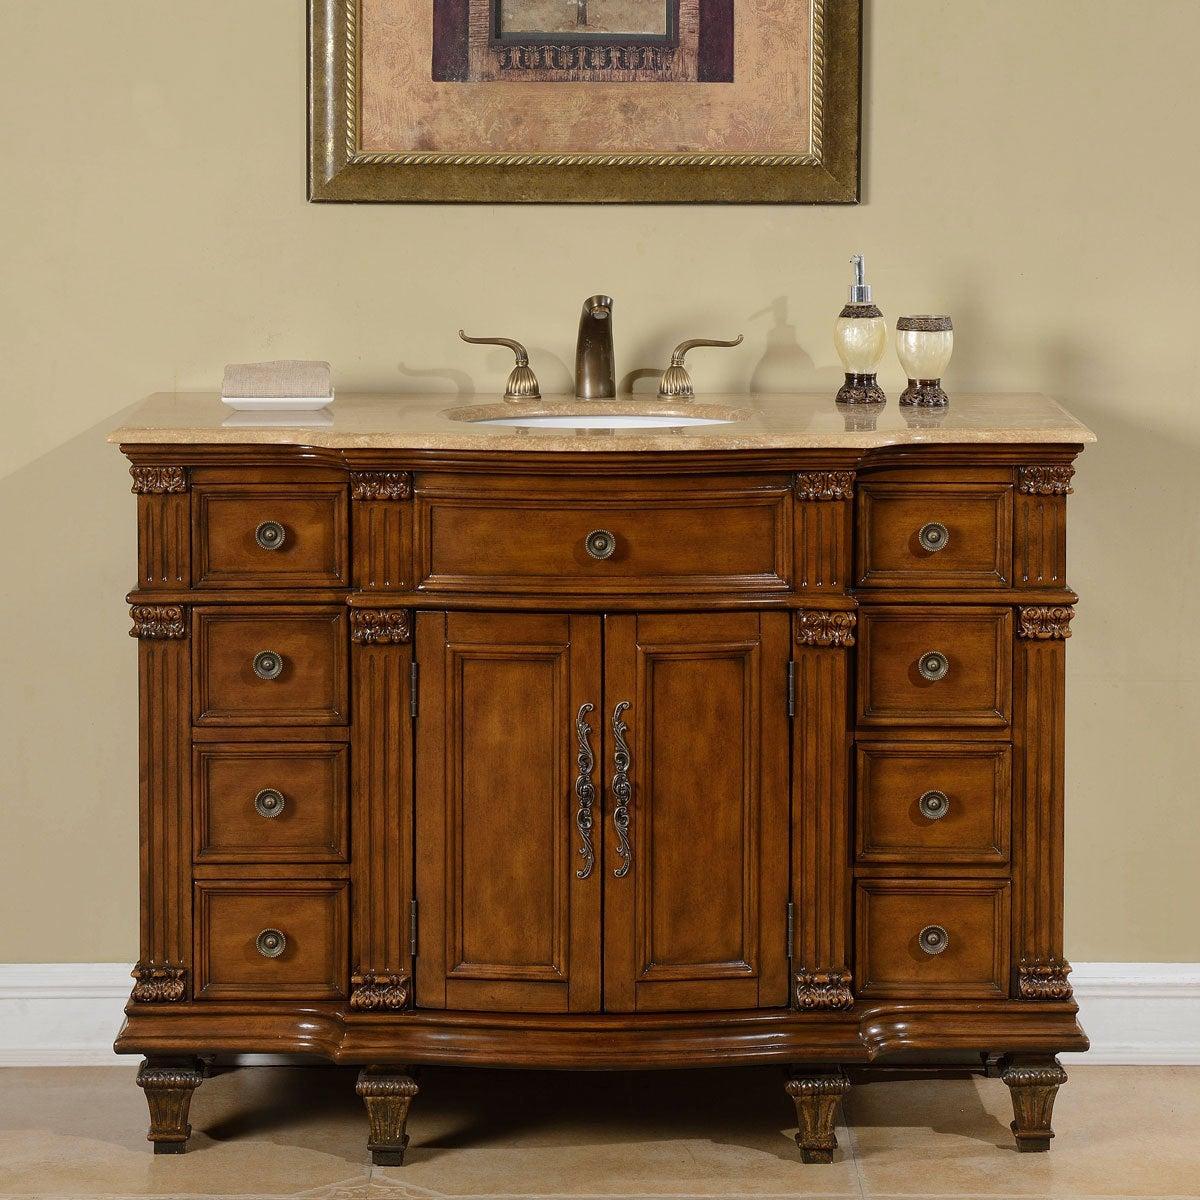 Silkroad Exclusive Travertine Stone Top Bathroom Single Sink Vanity Overstock 10240986